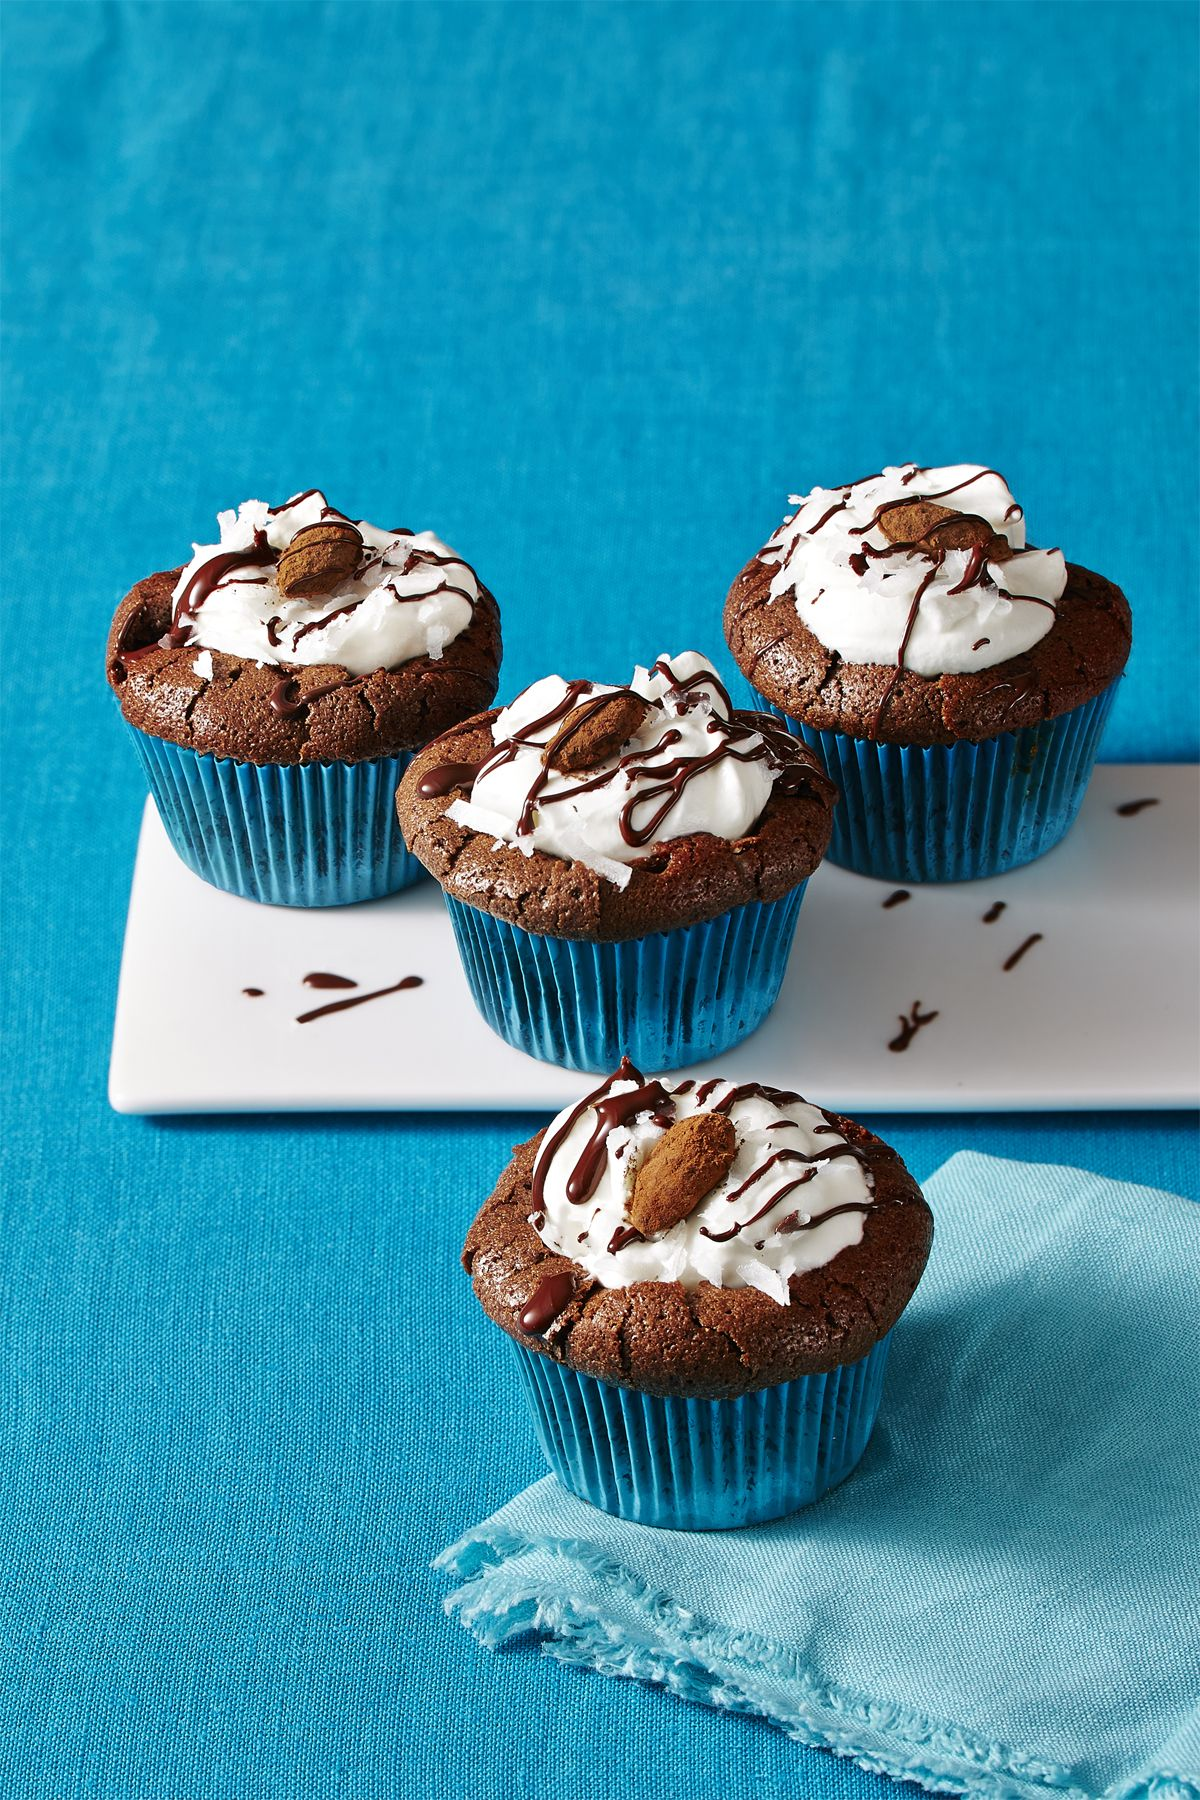 Valentine's Day Cakealmond joy cupcakes